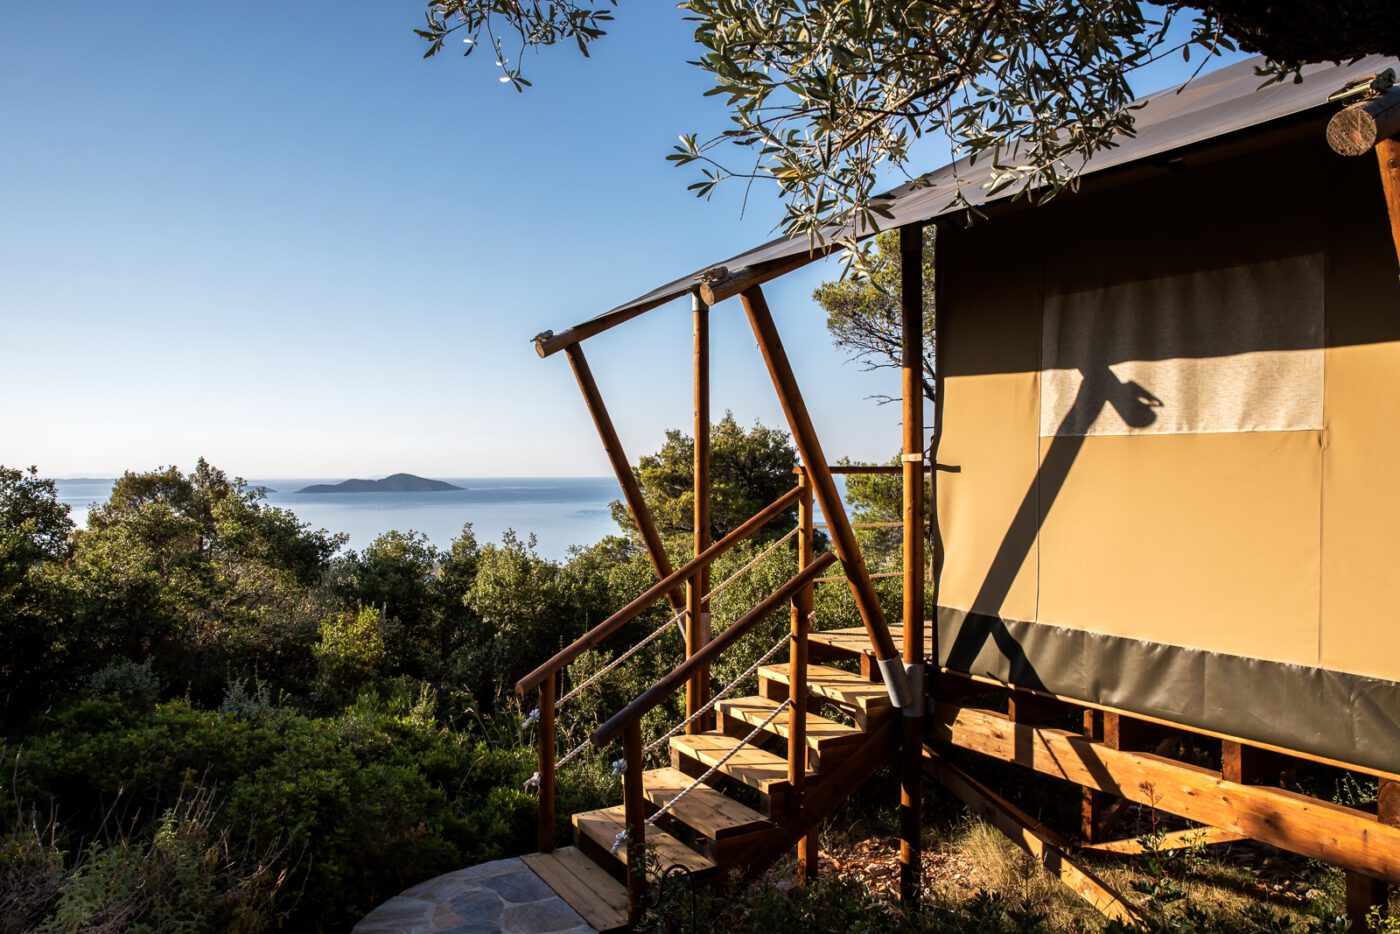 Amani-Spa-Luke-Wood-Safaritent-Griekenland-2